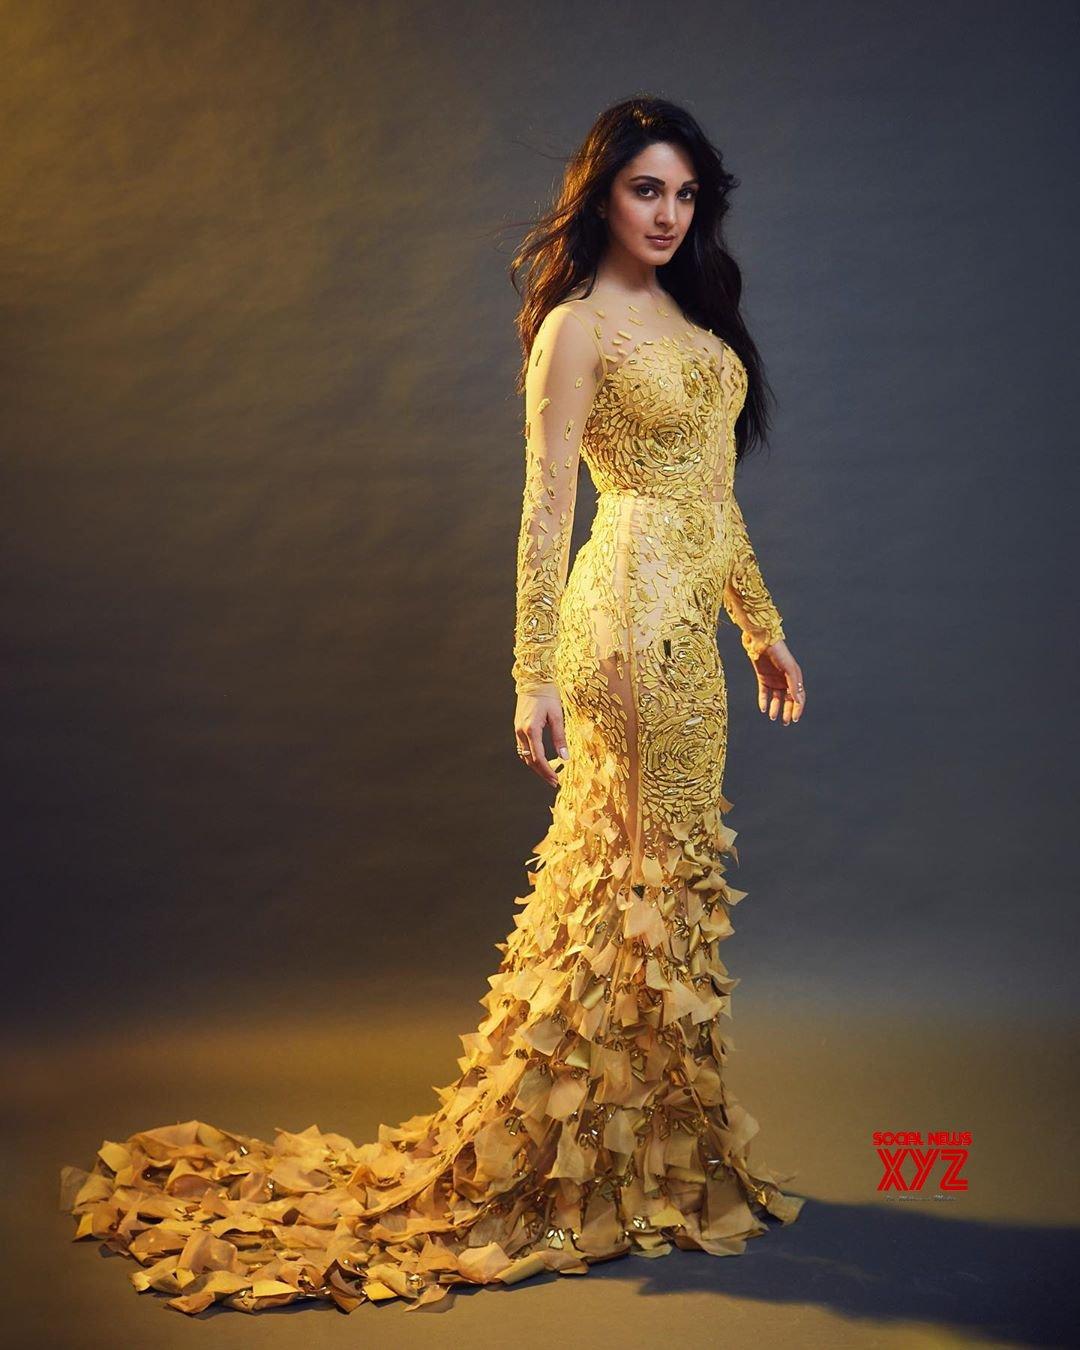 Actress Kiara Advani Hot And Sexy Stills From Filmfare